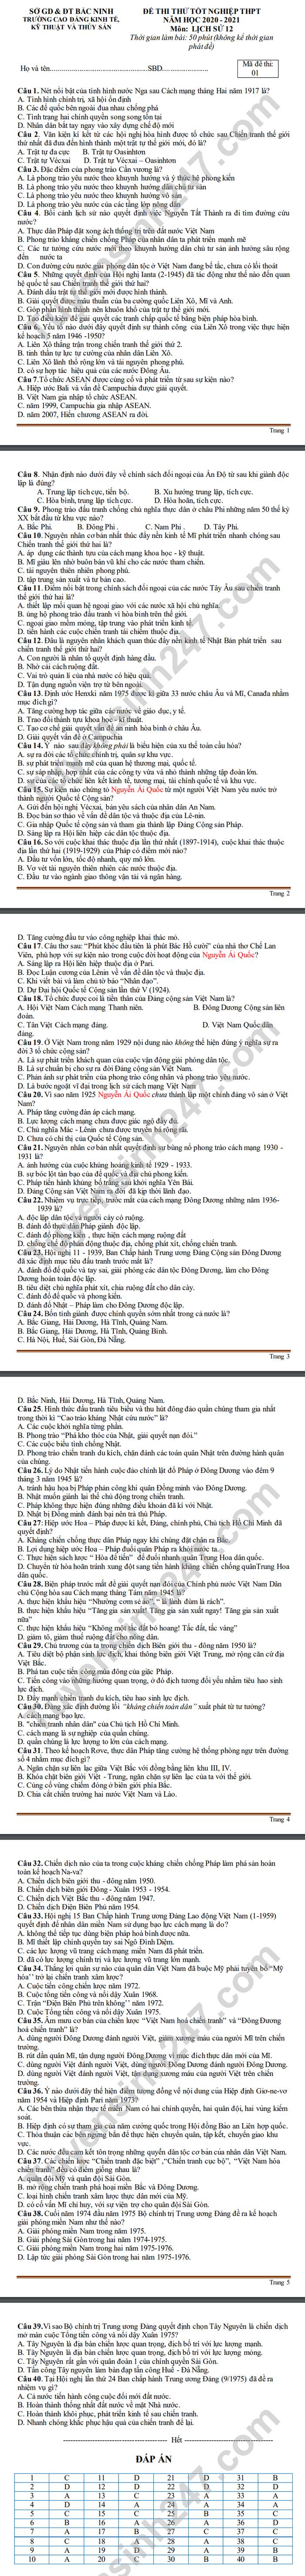 De thi thu tot nghiep THPT 2021 CD Kinh Te, Ky Thuat va Thuy San mon Su